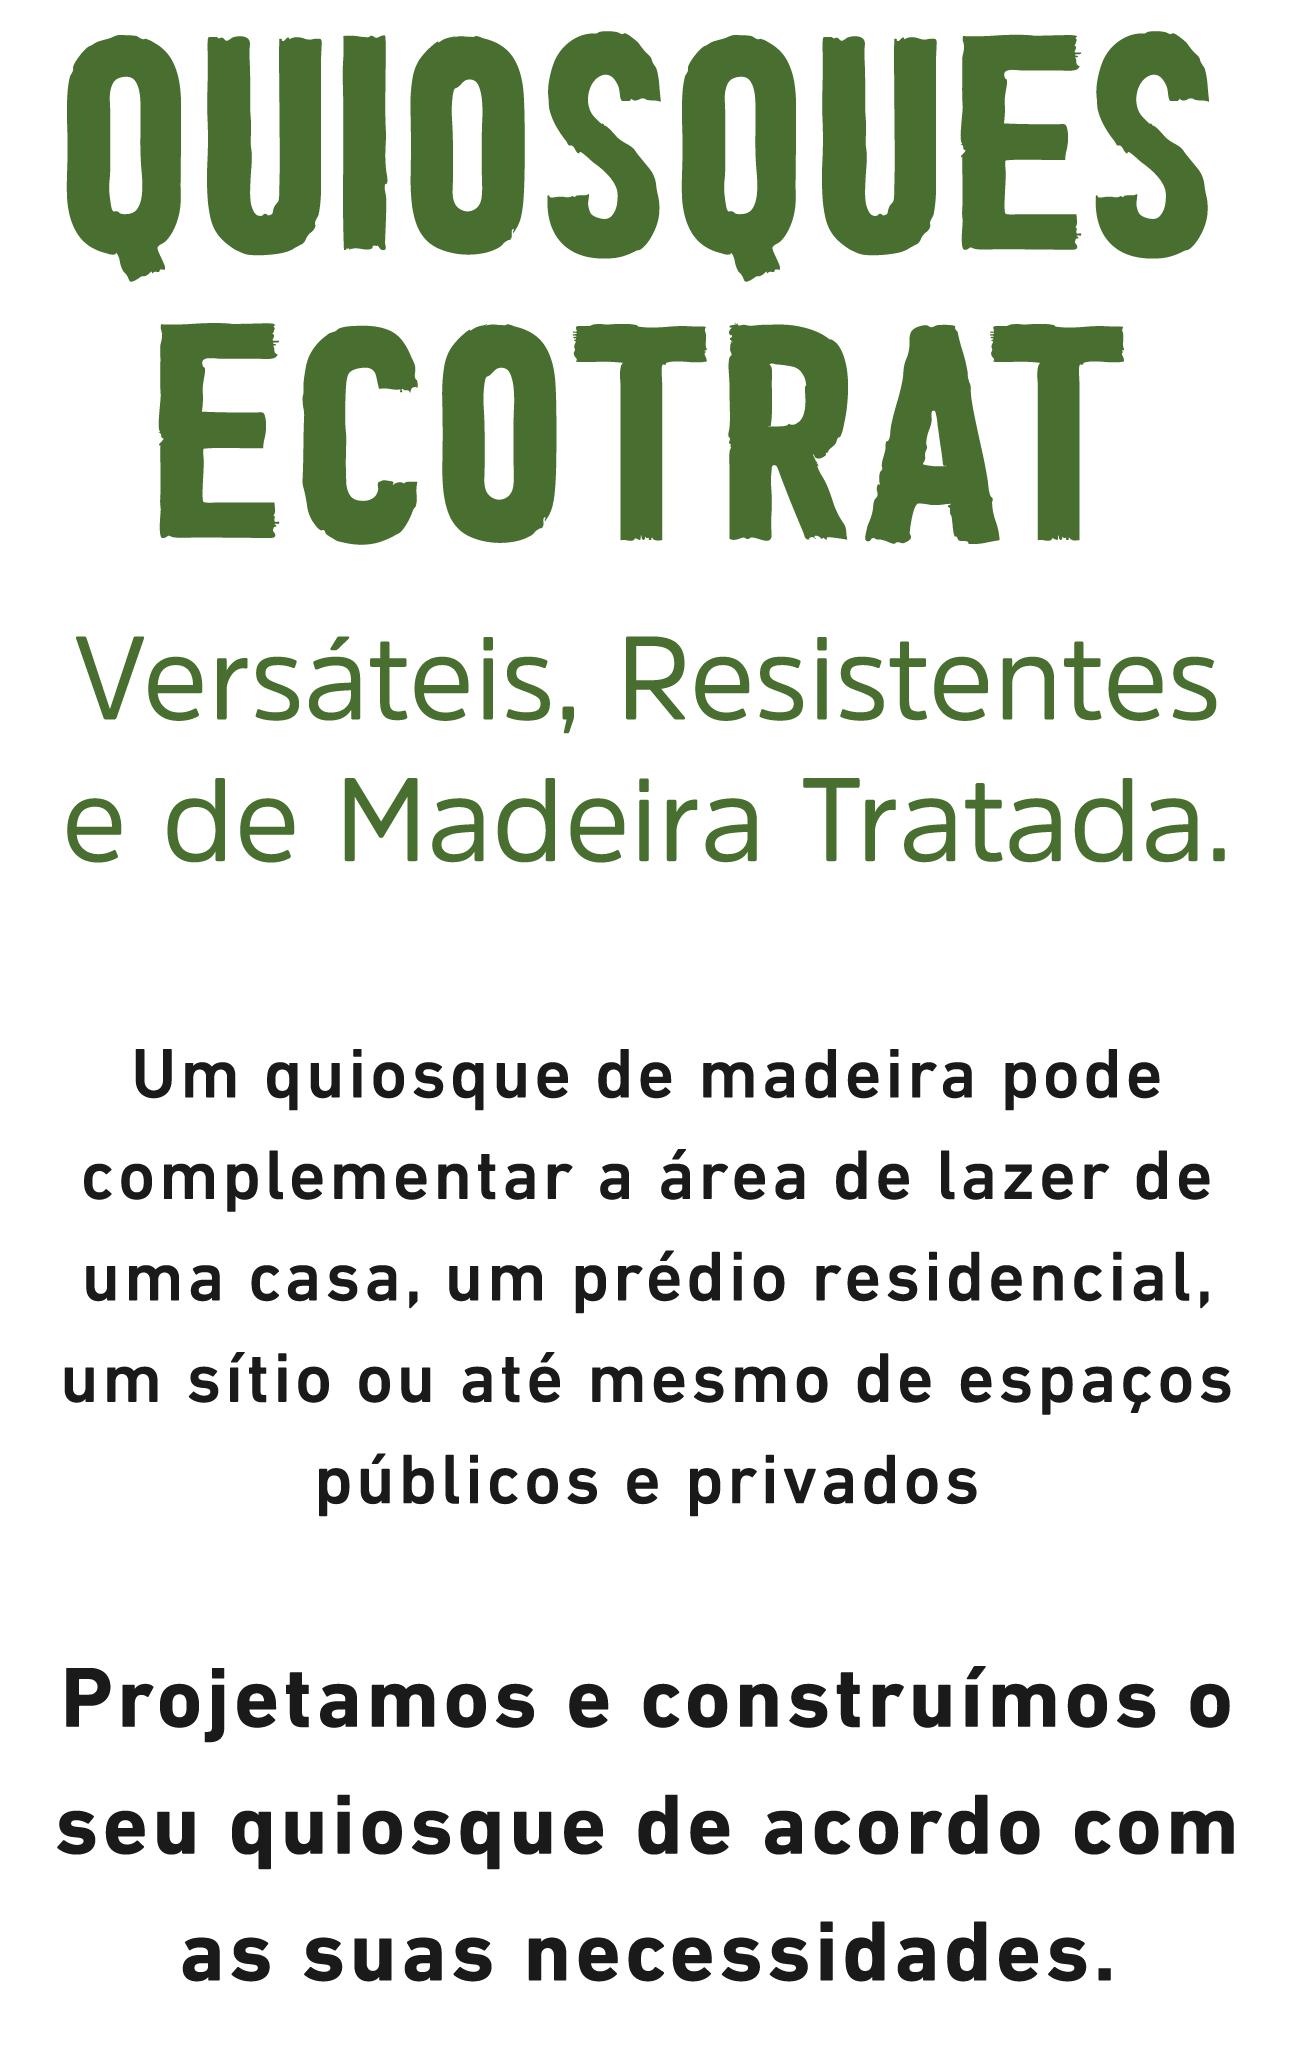 Ecotrat - Madeiras Tratadas | Quiosques Ecotrat